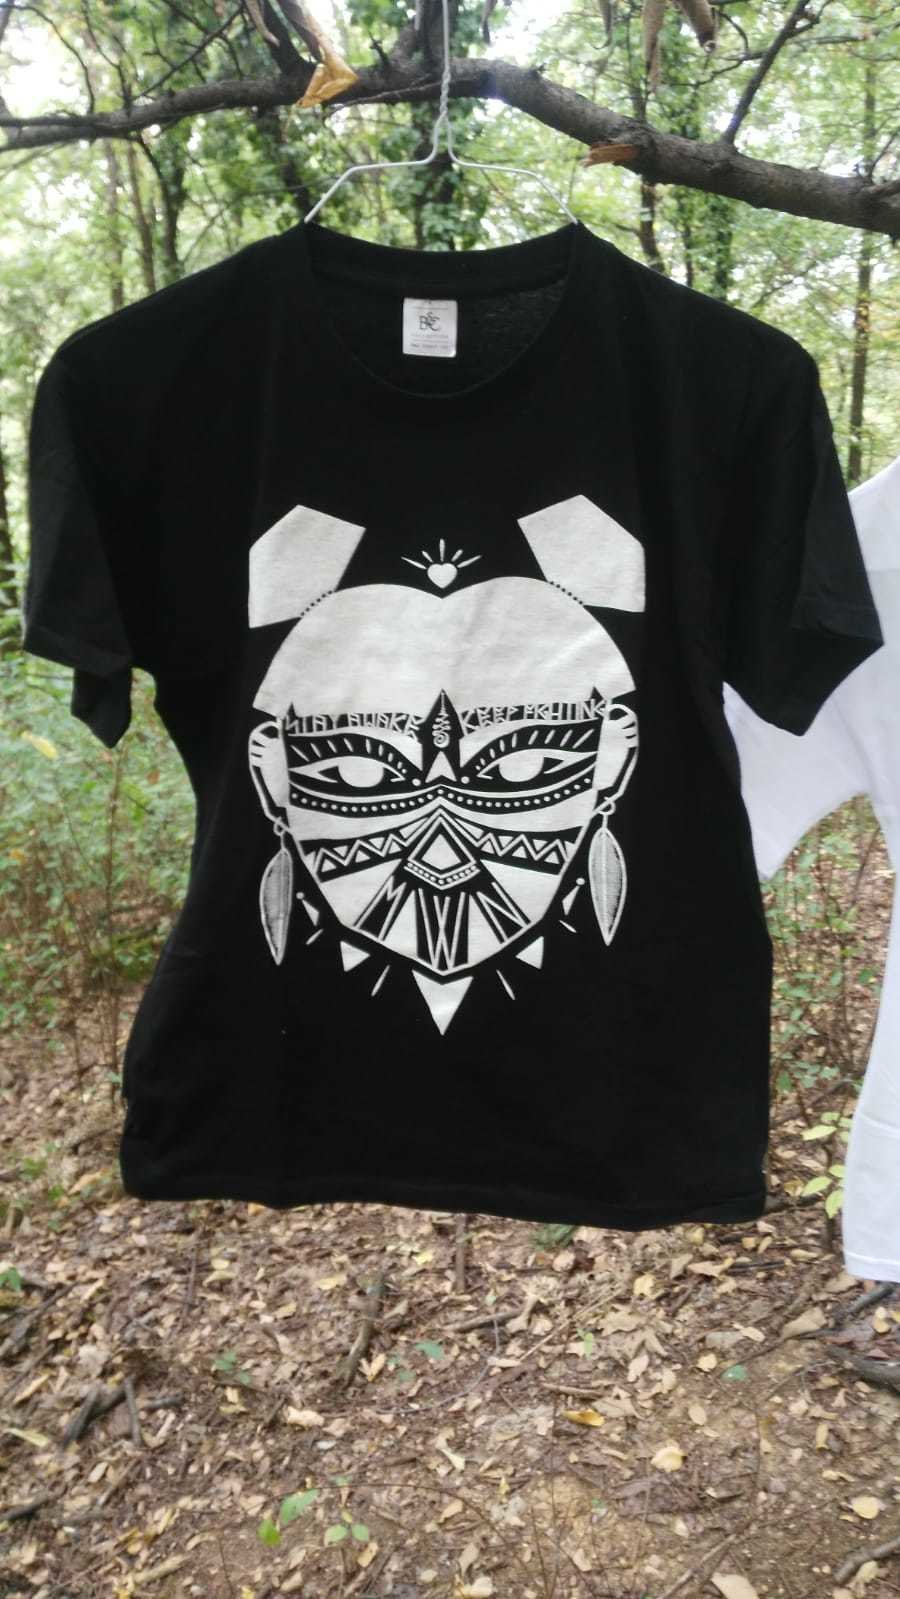 MOWAN - Stay Awake - Tribal Woman Libereria T-shirt Black 00000